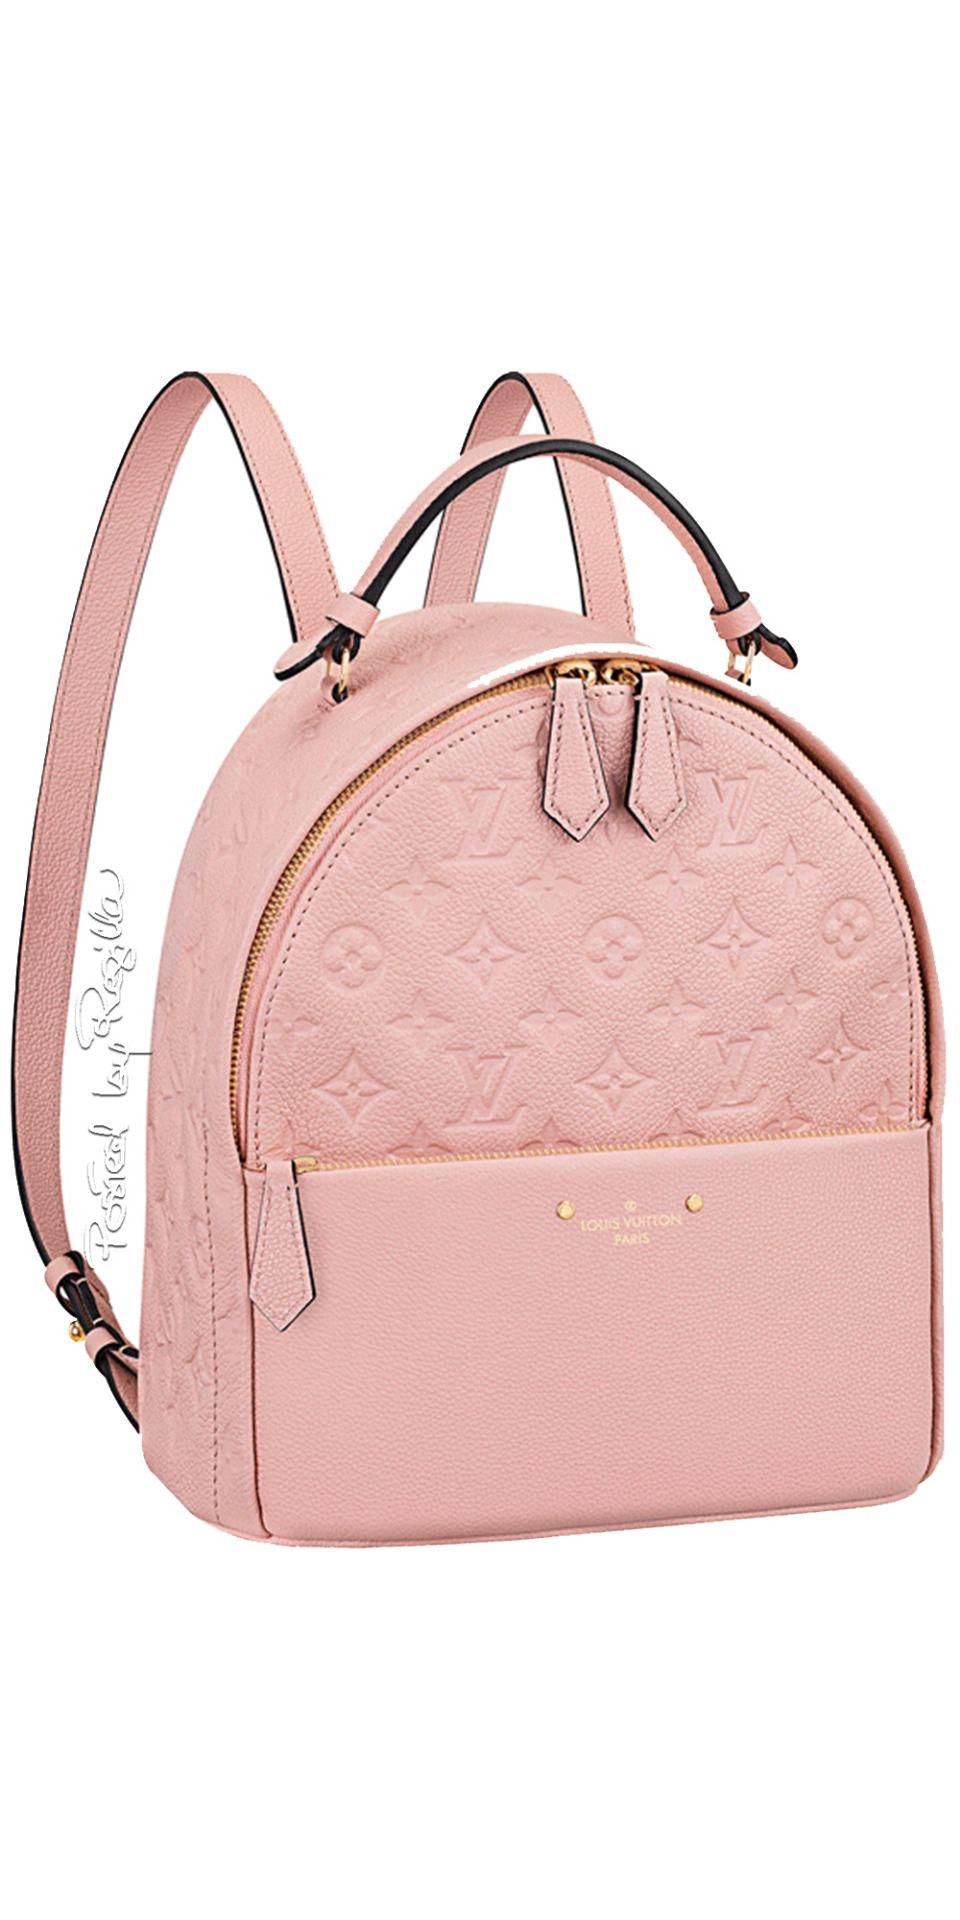 eb306a2a401f Regilla ⚜ Louis Vuitton   BAGS   Acessórios, Mochila et Acessórios ...